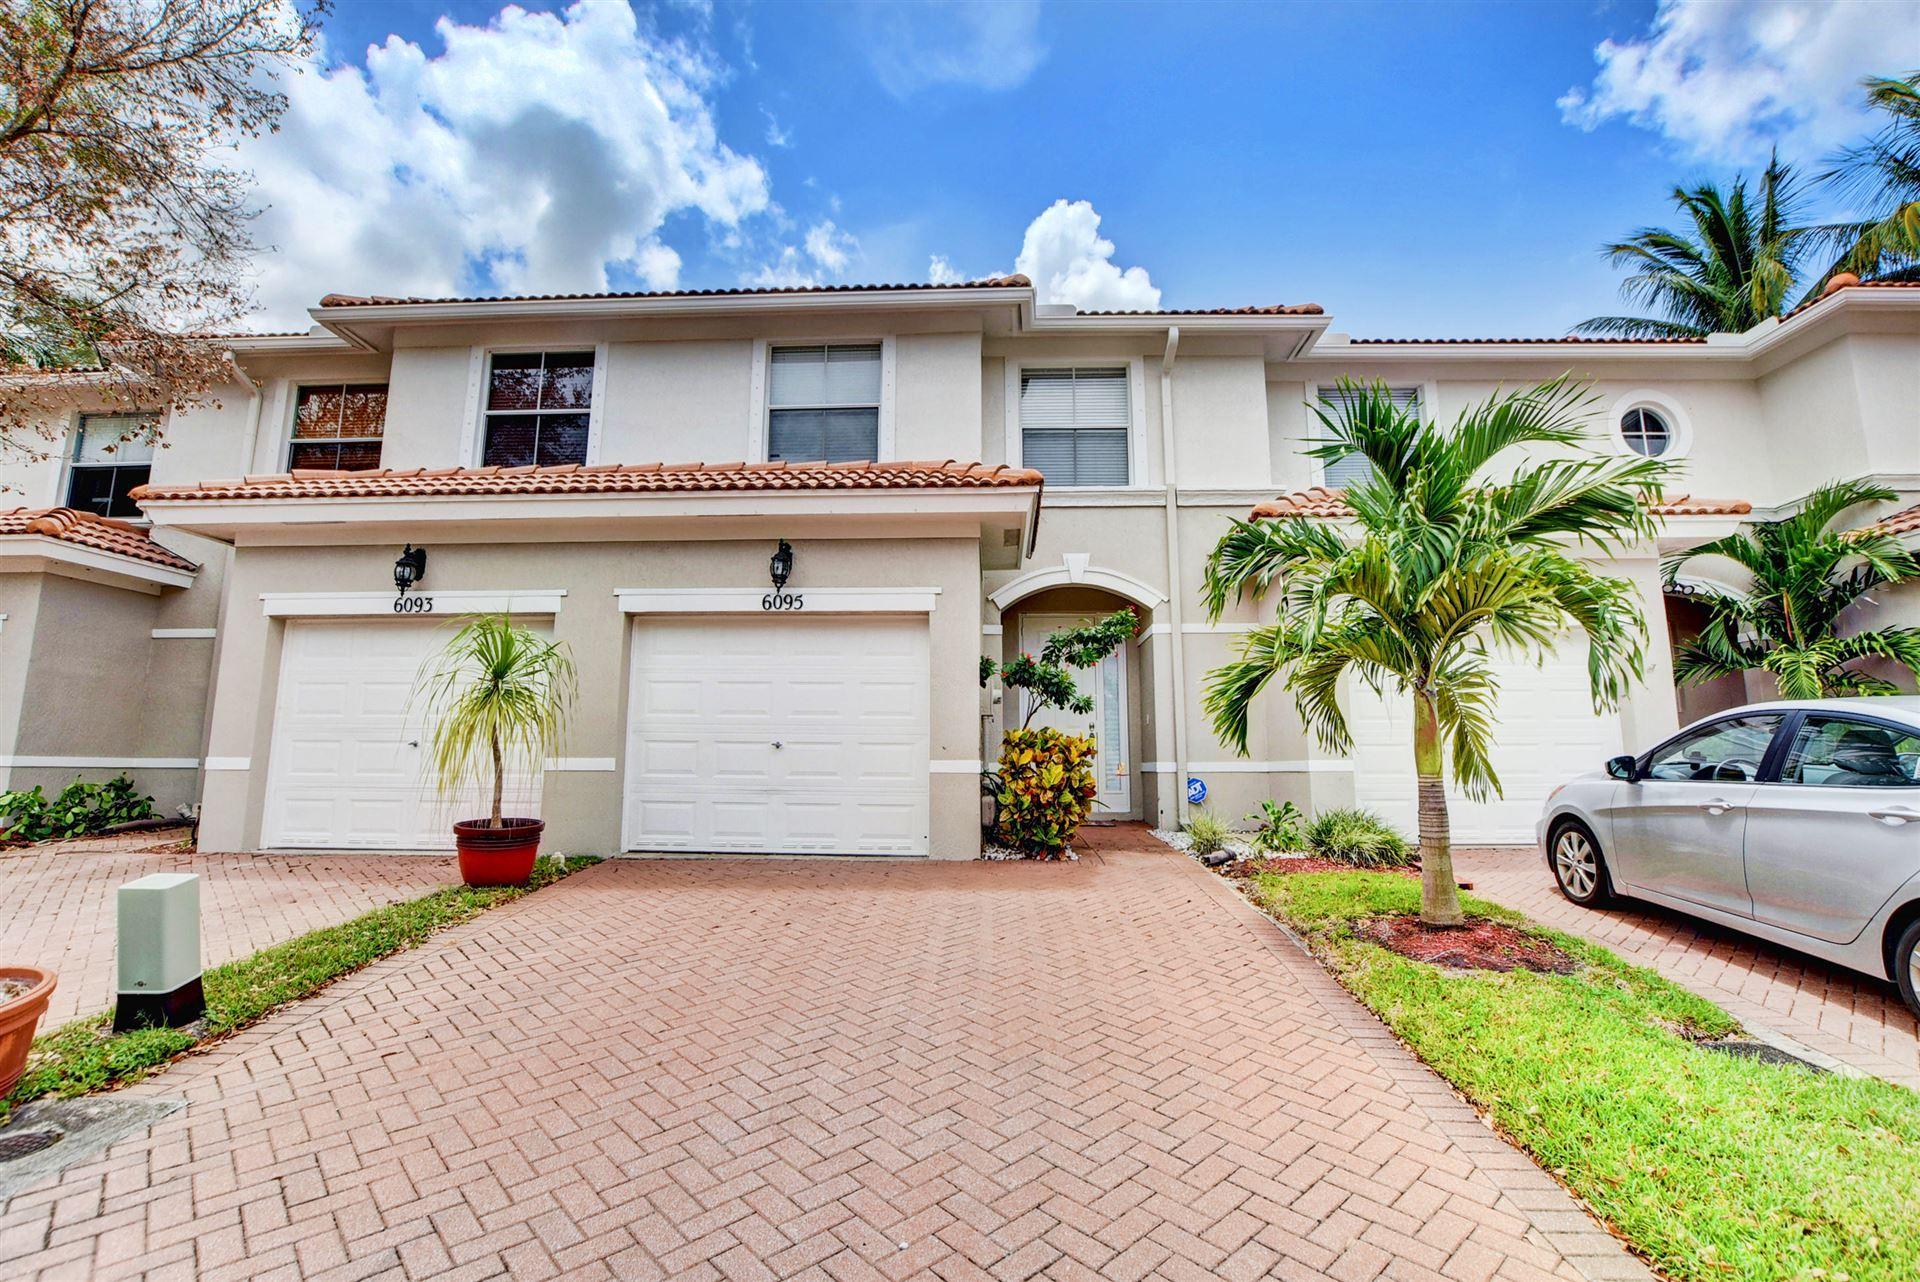 6095 Seminole Gardens Circle, Riviera Beach, FL 33418 - #: RX-10643408